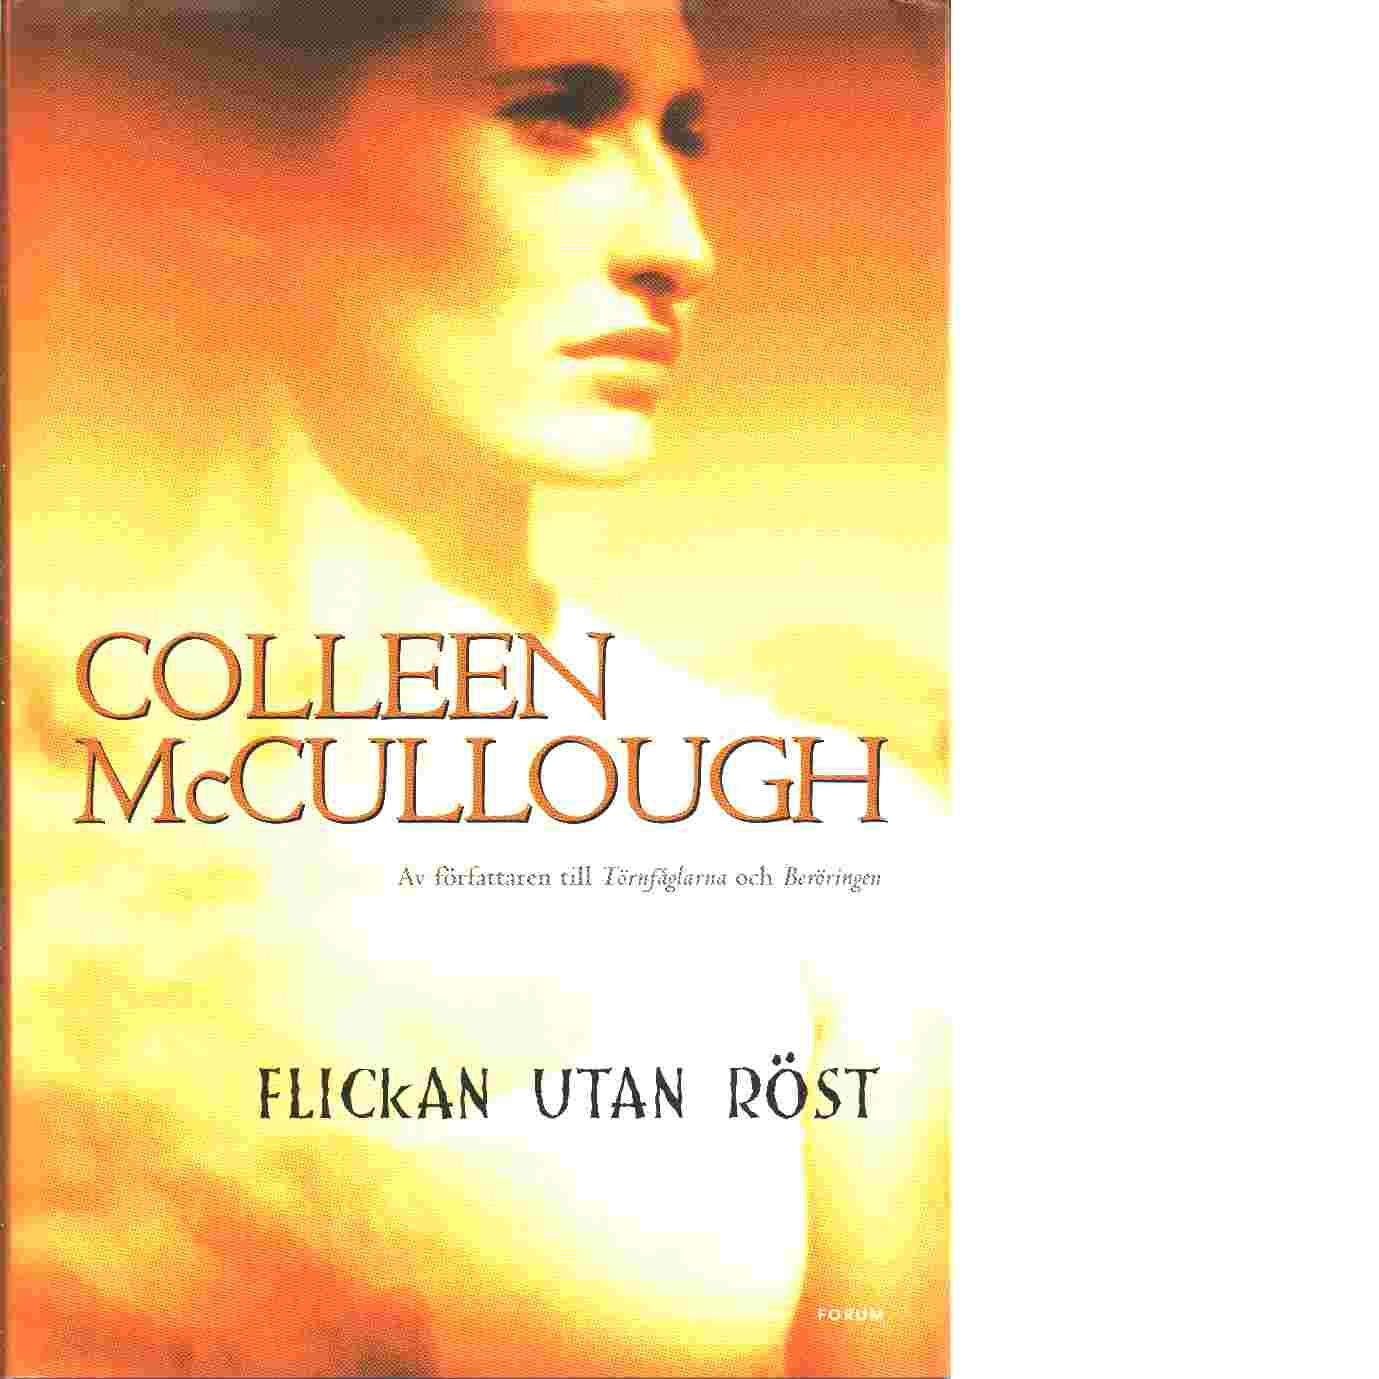 Flickan utan röst - McCullough, Colleen